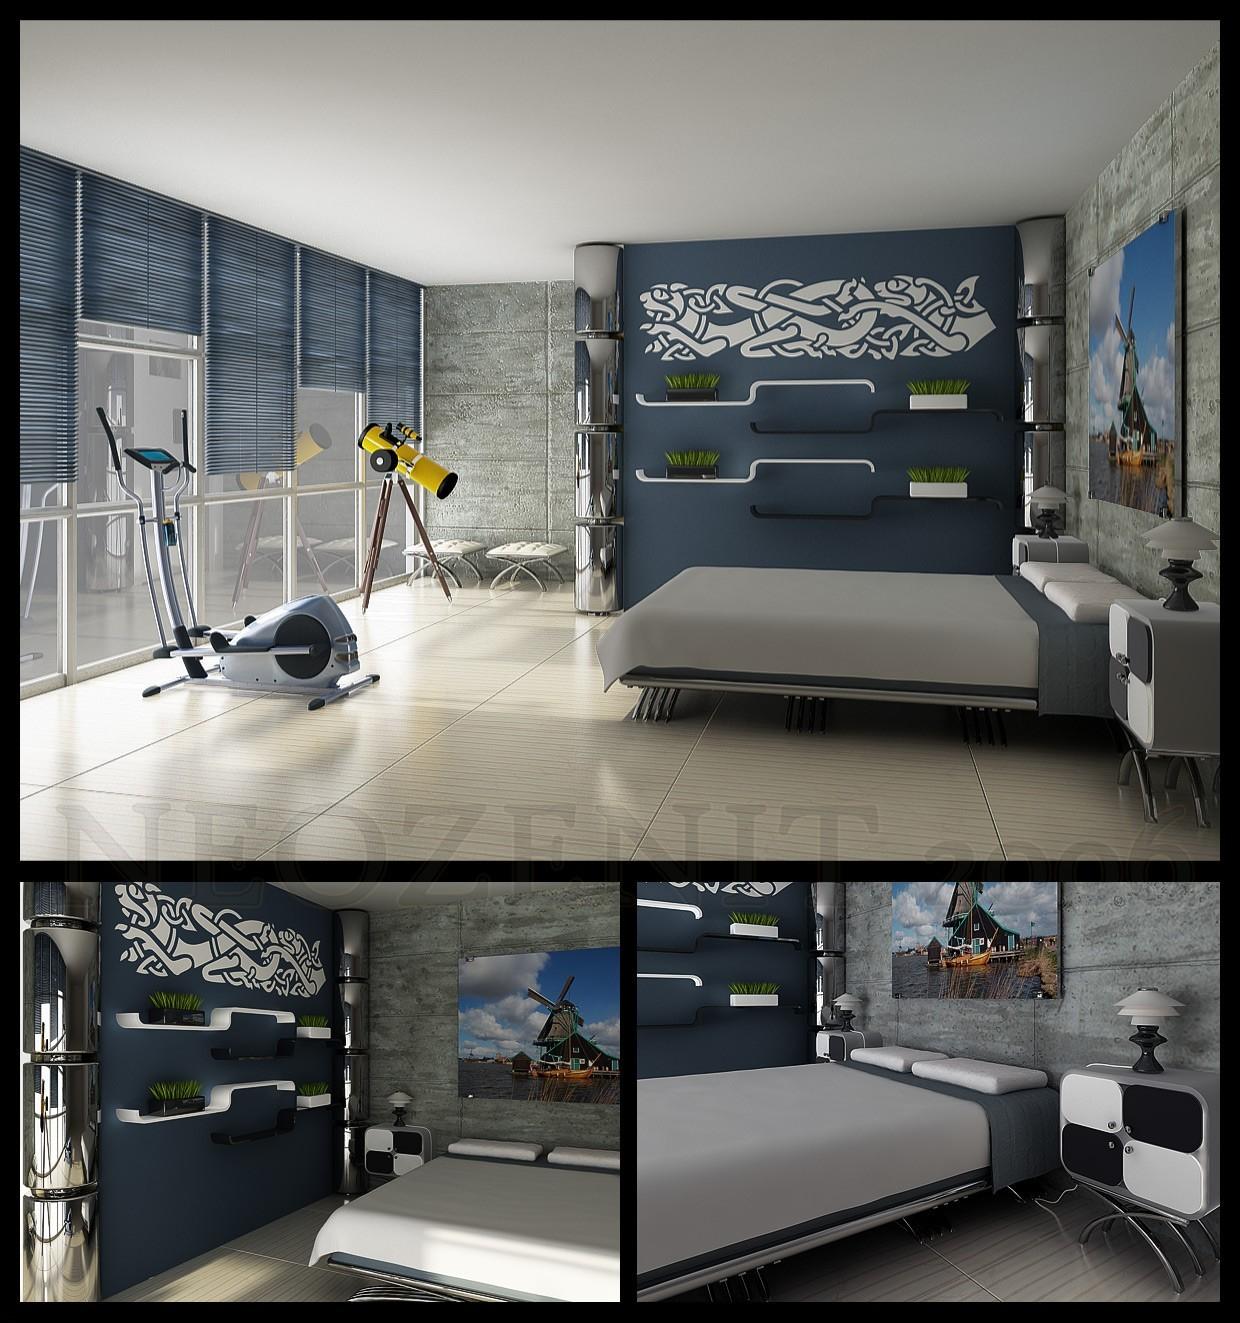 Neozenit room for a friend 1 daba75a5 hktt